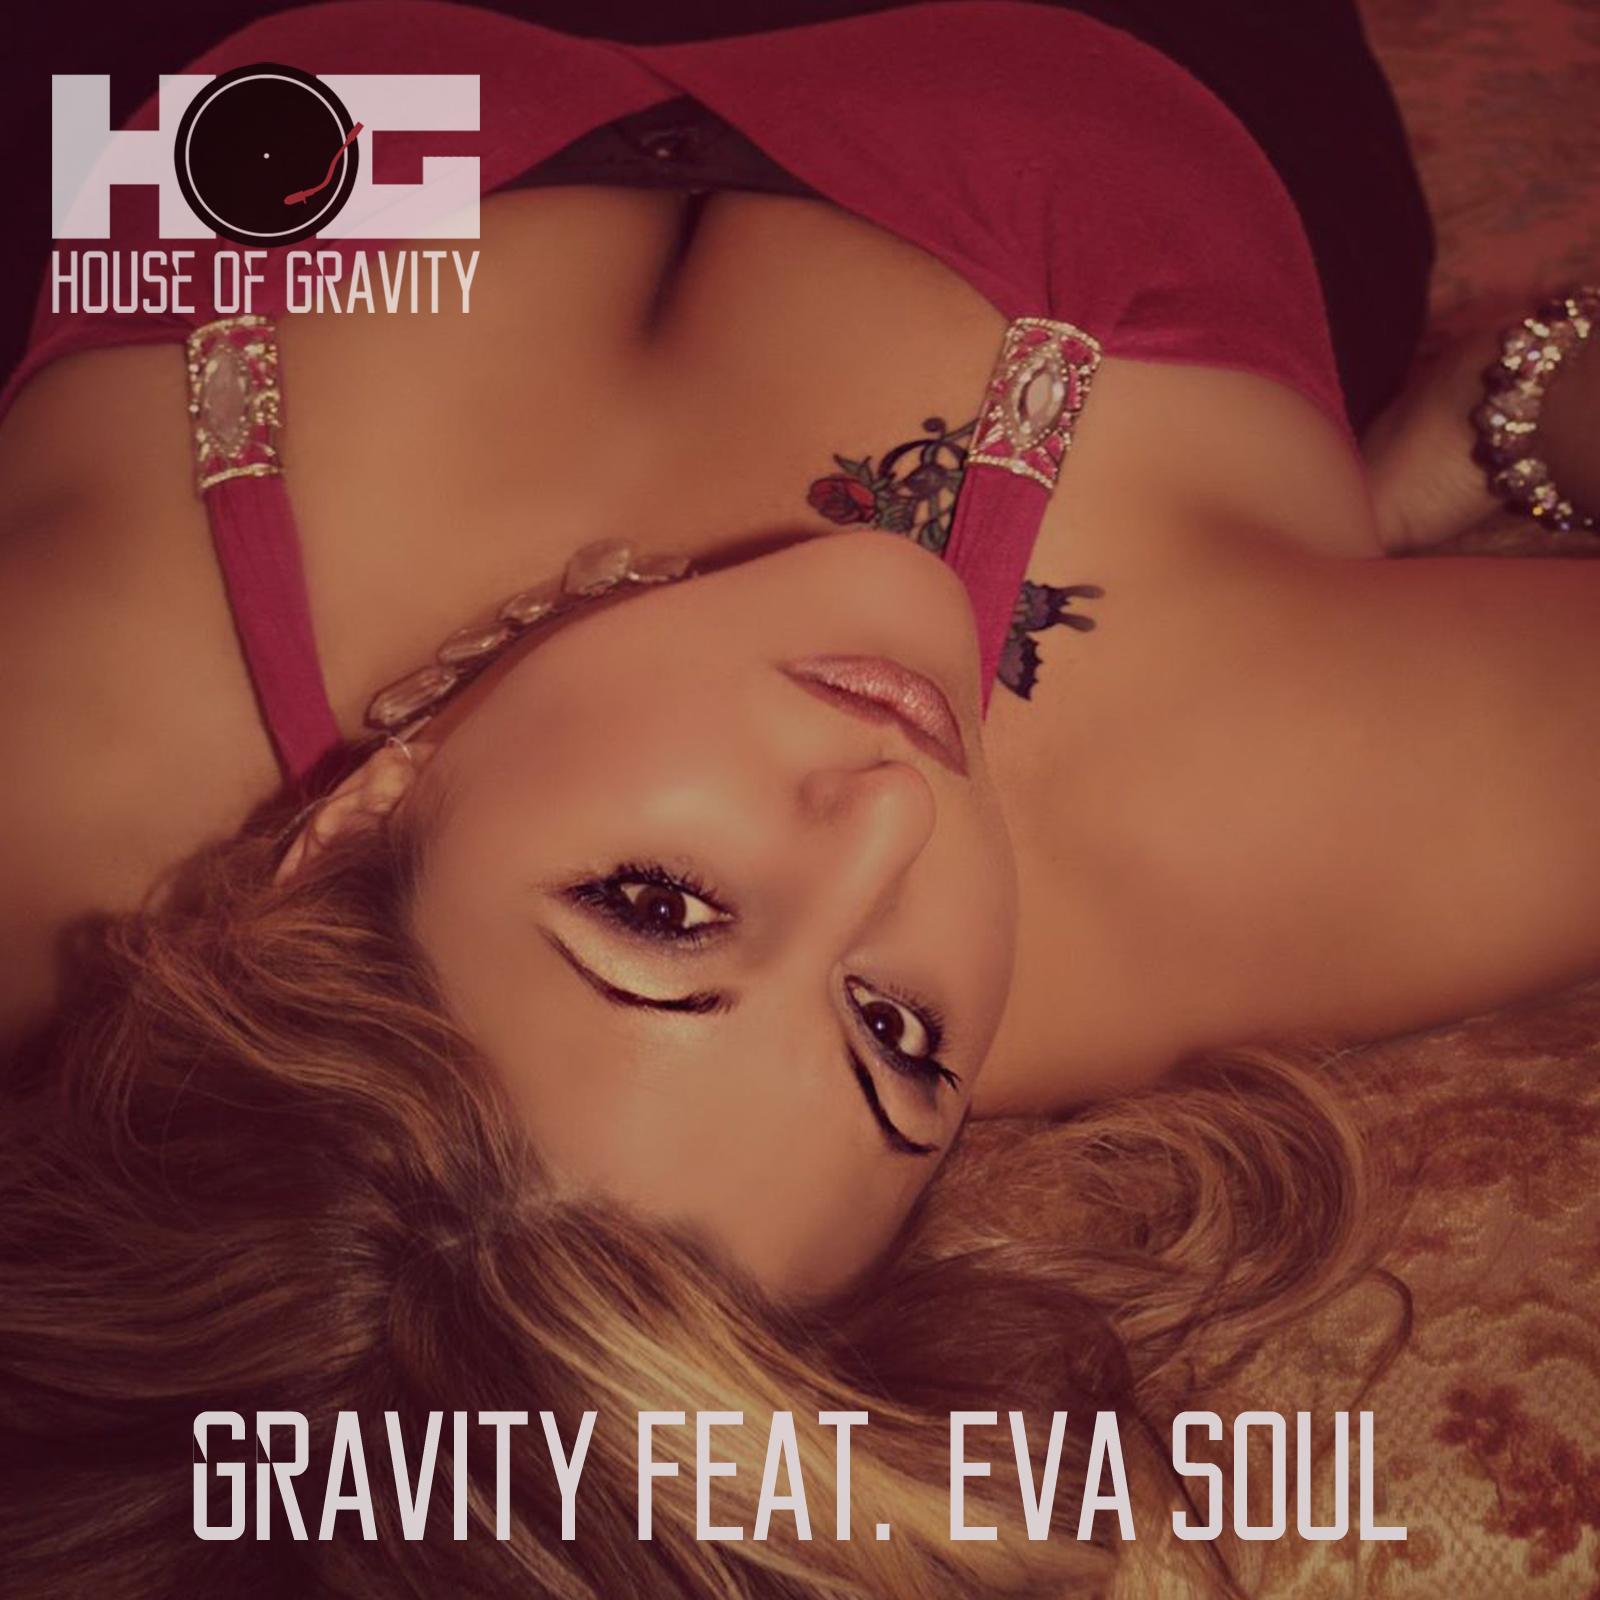 Gravity feat. Eva Soul